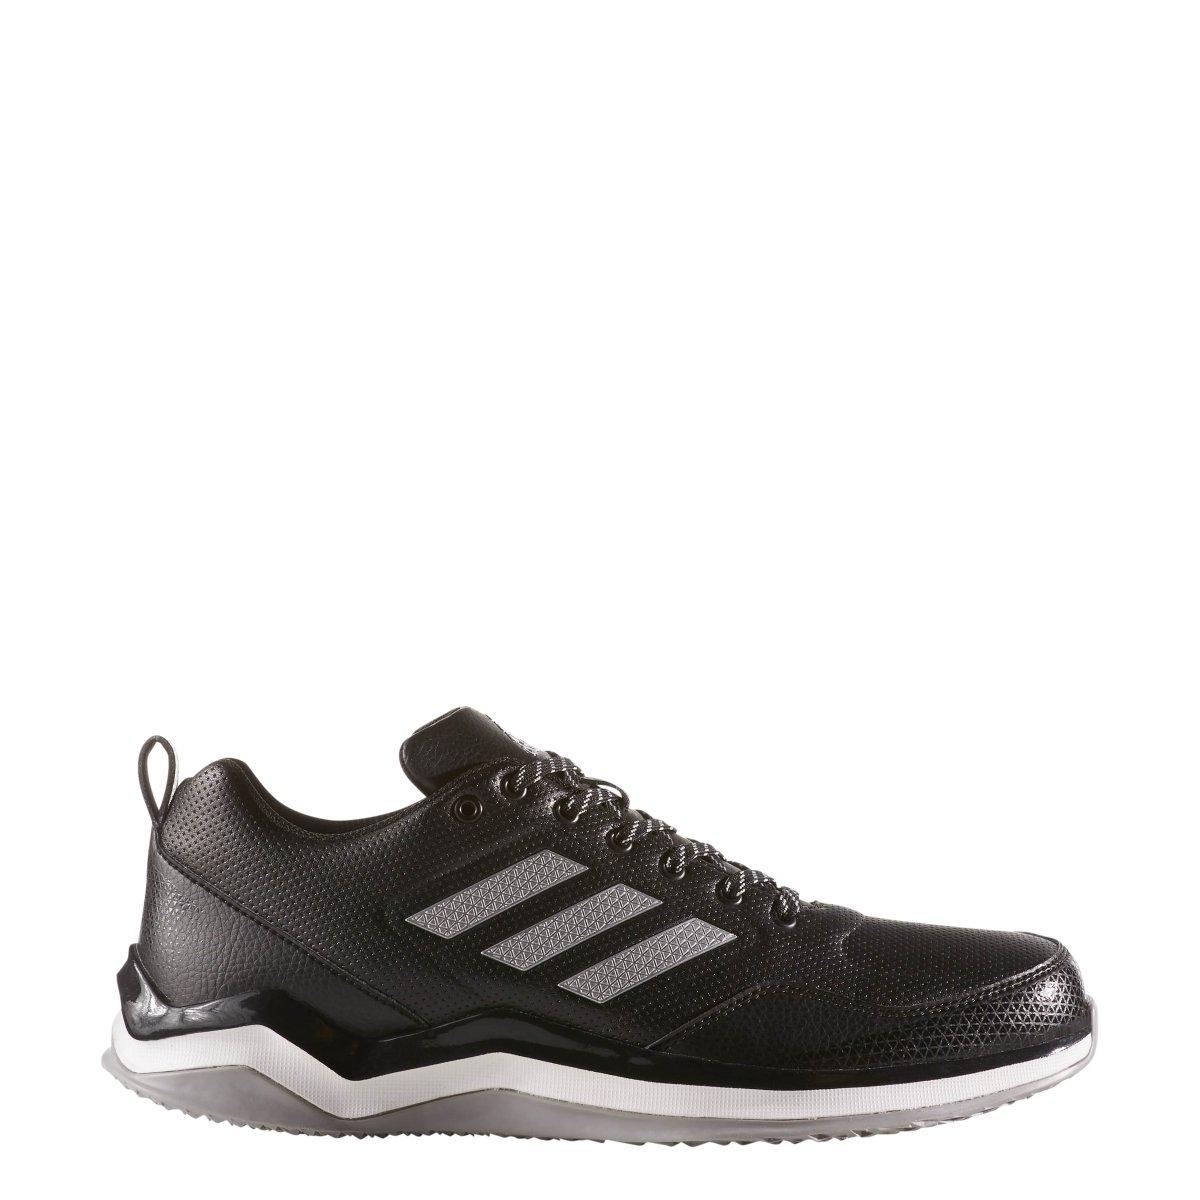 adidas Men's Freak X Carbon Mid Cross Trainer, Black/Metallic Silver/White, 8.5 Medium US